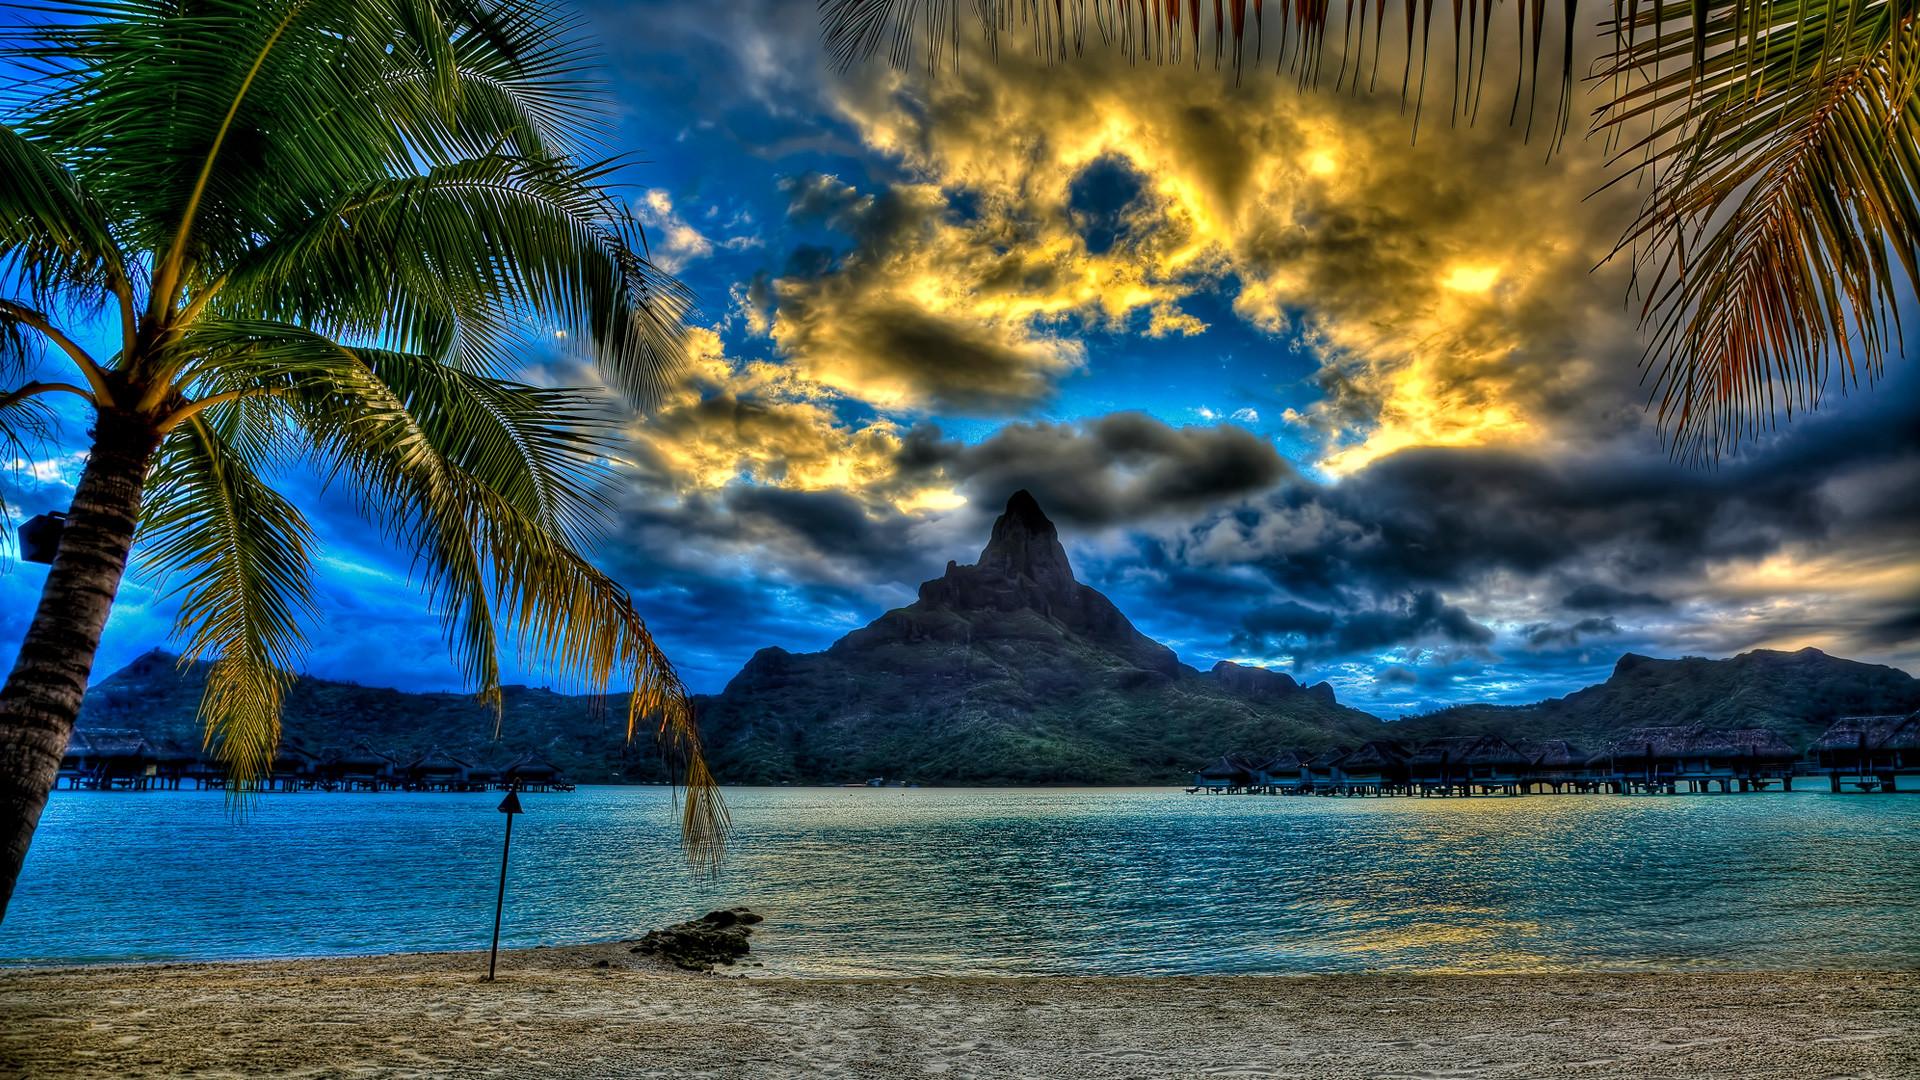 Res: 1920x1080, Download Size: px · Tahiti - Bora Bora